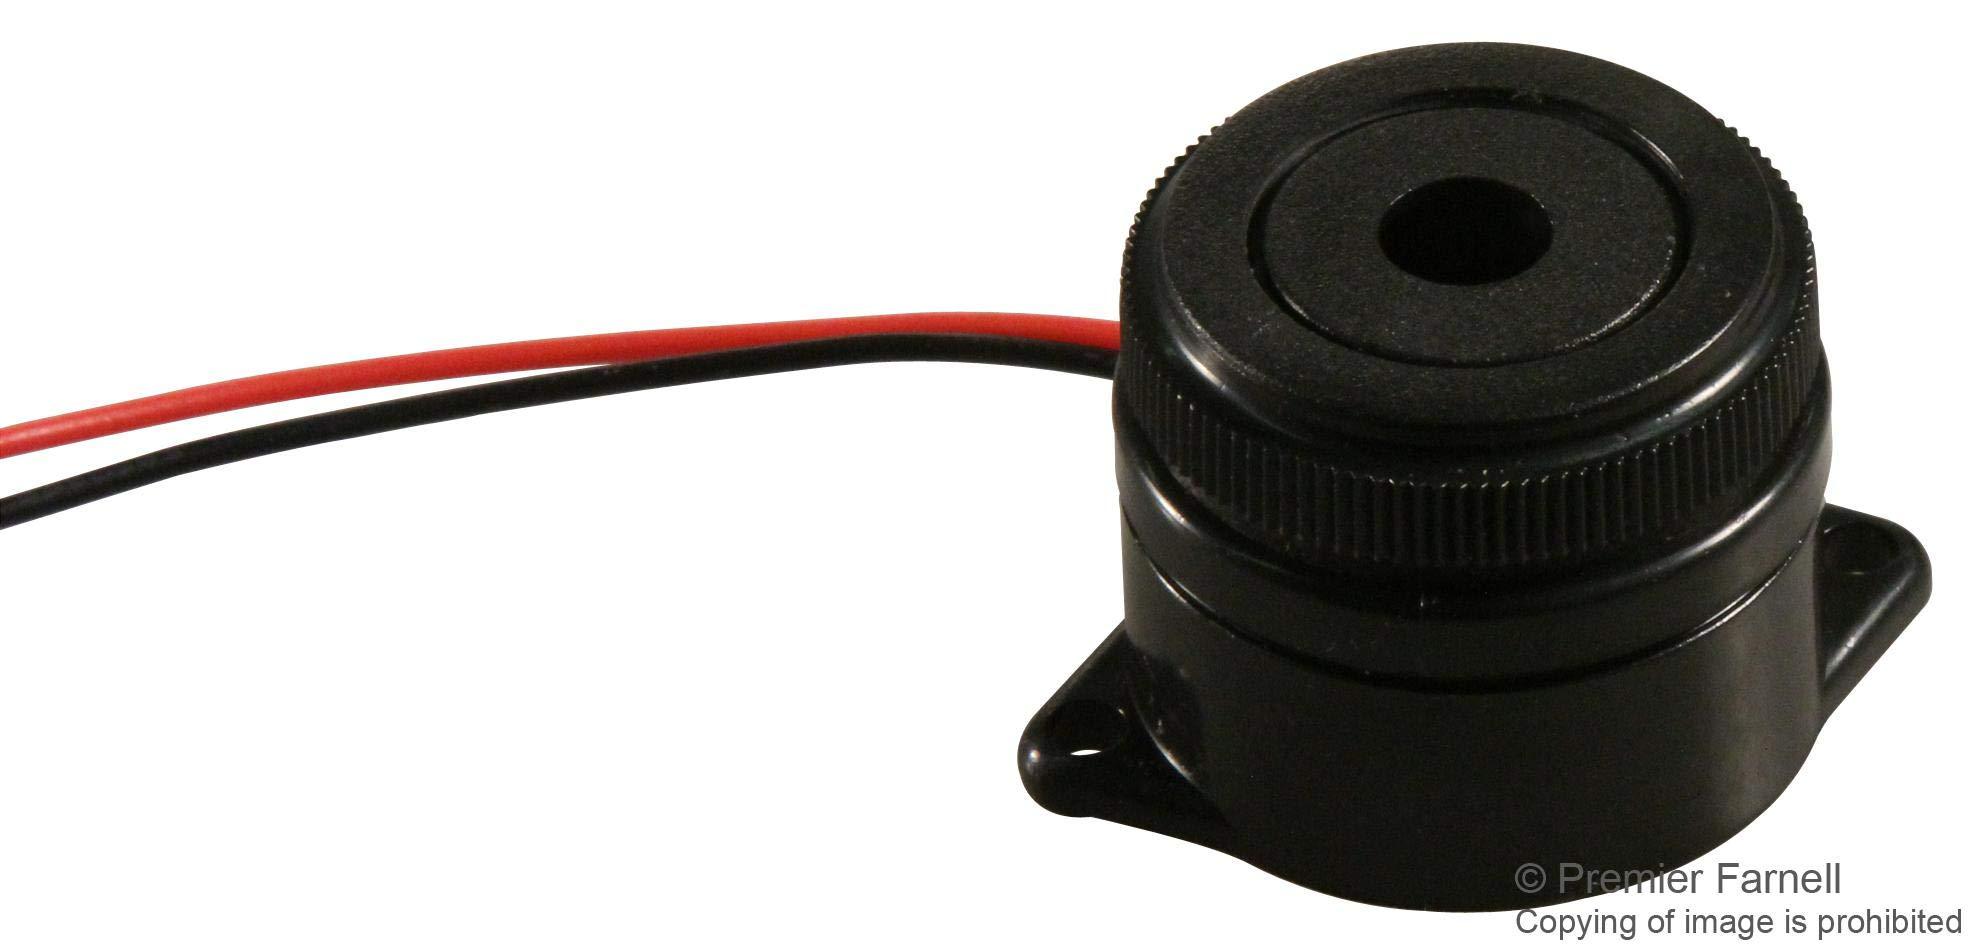 MCKPI-G2910L-3678 - Transducer, Piezo, Buzzer, Buzzer, Continuous, 3 V, 24 V, 15 mA, 95 dB (MCKPI-G2910L-3678) (Pack of 10) by MULTICOMP